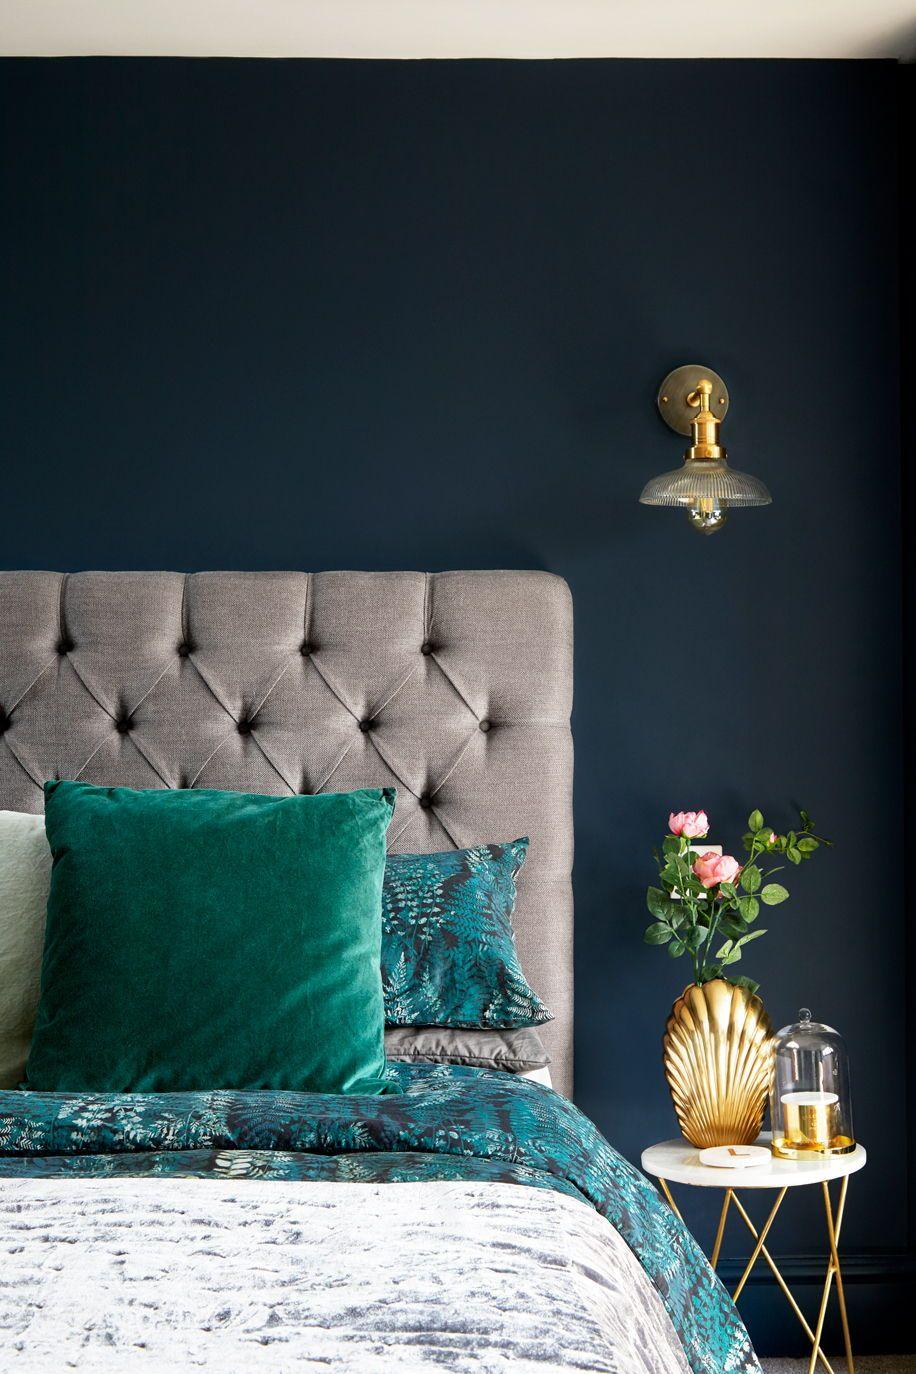 Loft bedroom with ensuite  DARK u ELEGANT LOFT BEDROOM u ENSUITE FROM LONDON BASED INTERIOR